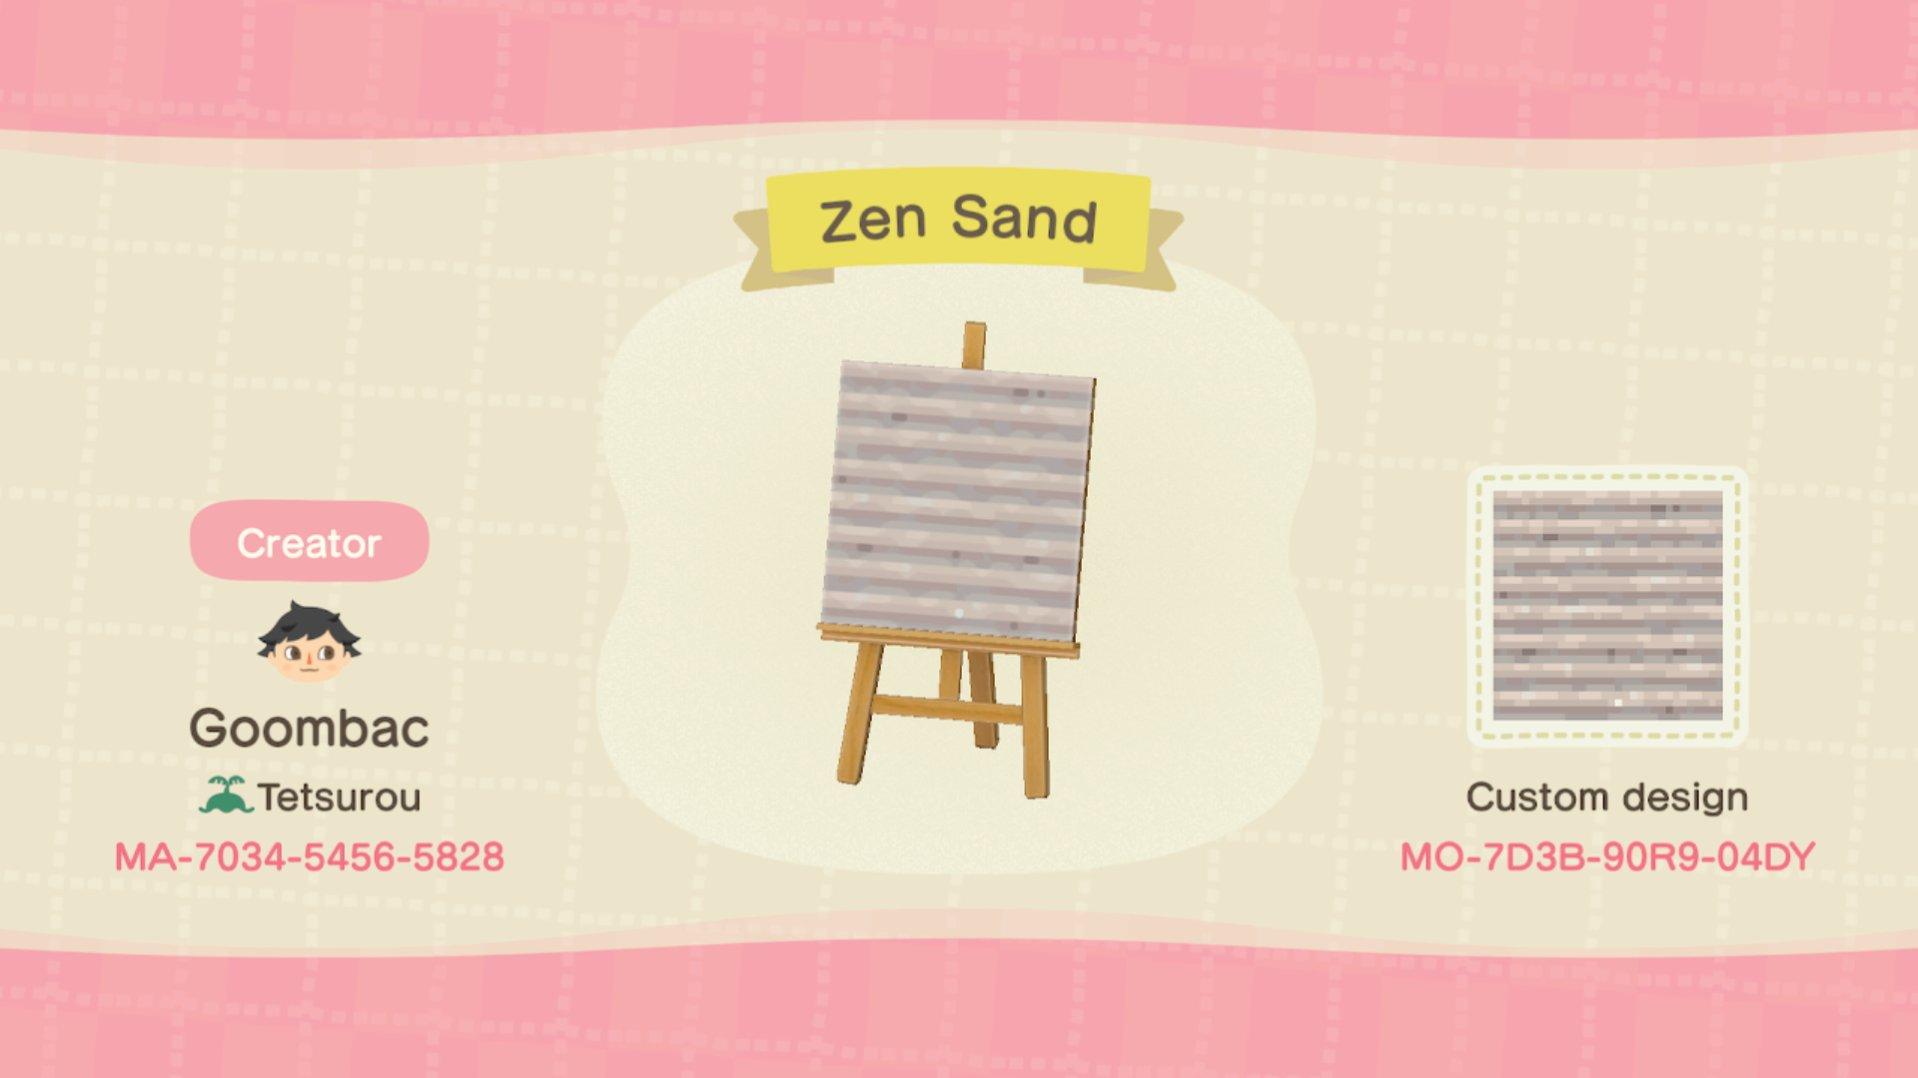 Goombac On Twitter Made Some Custom Zen Garden Textures In Animal Crossing Animalcrossingnewhorizons Animalcrossing Acnh